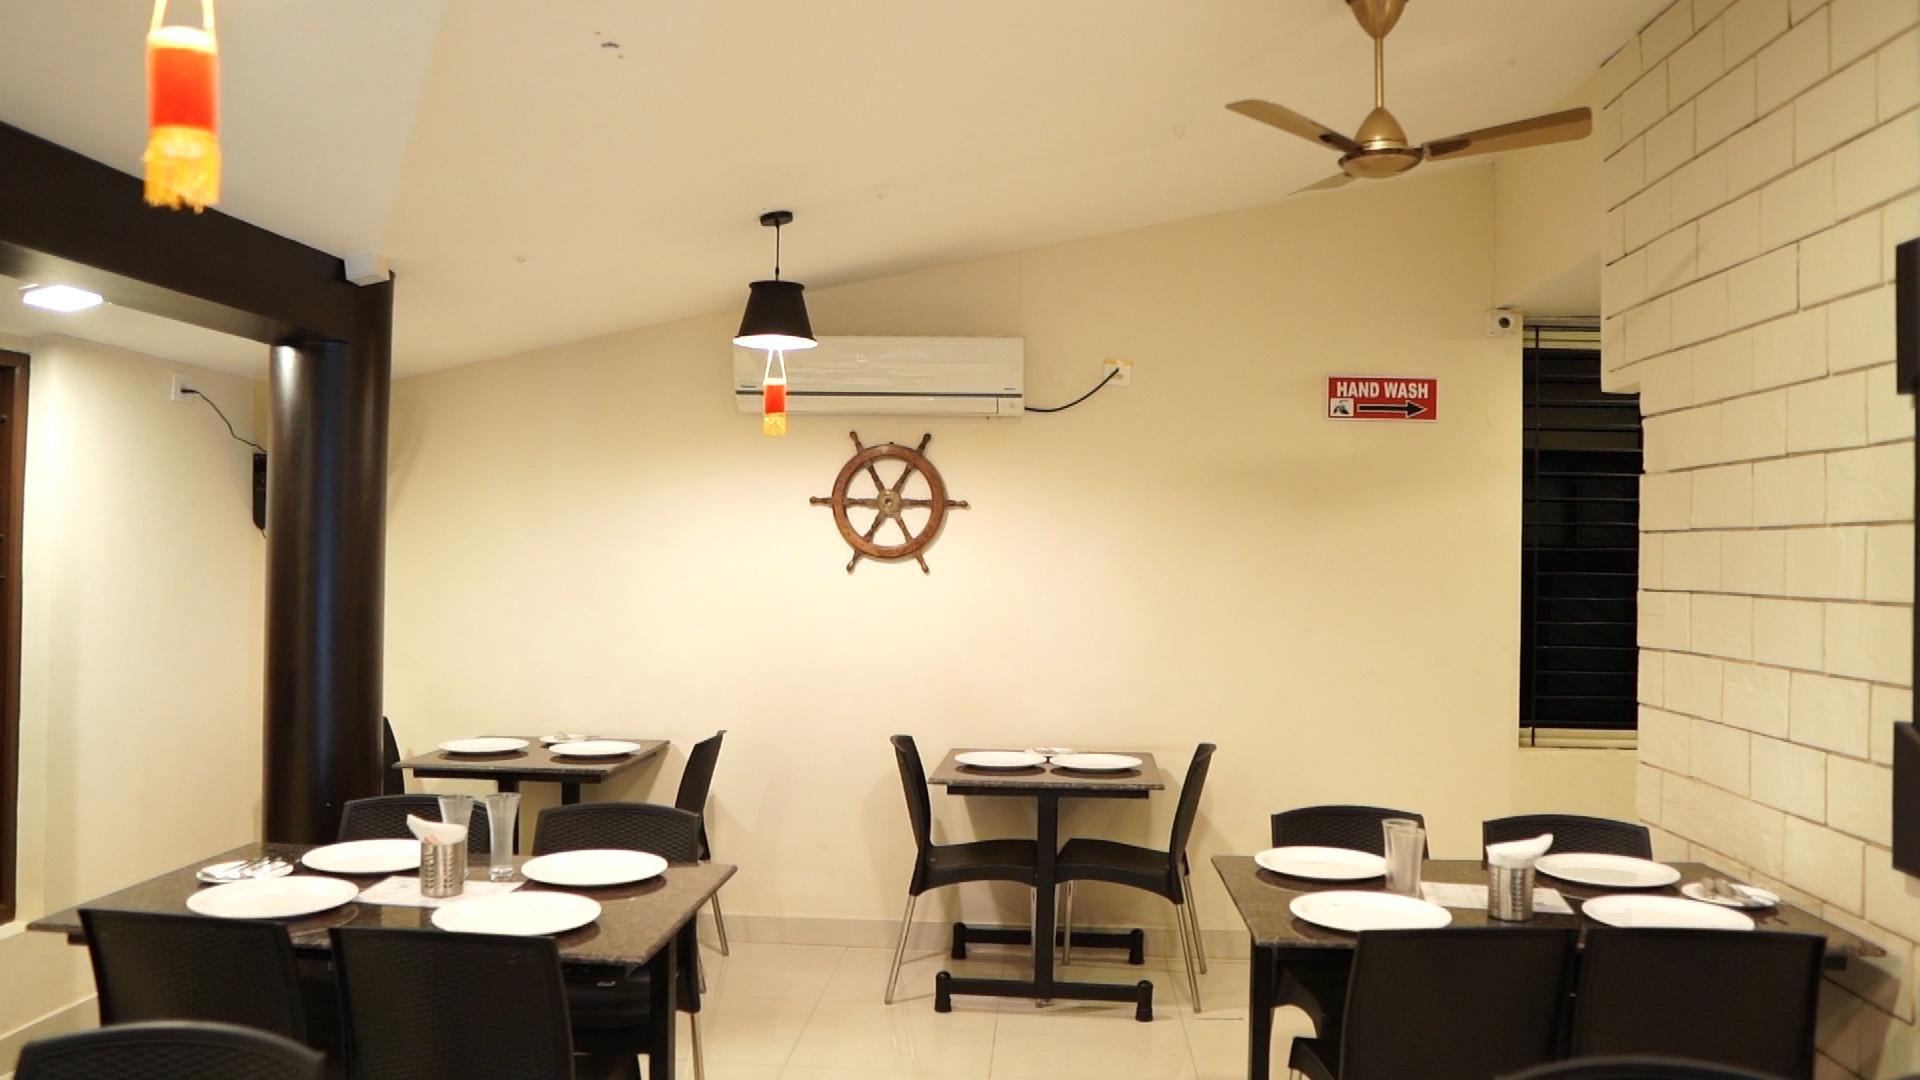 Malpe Restaurants photos